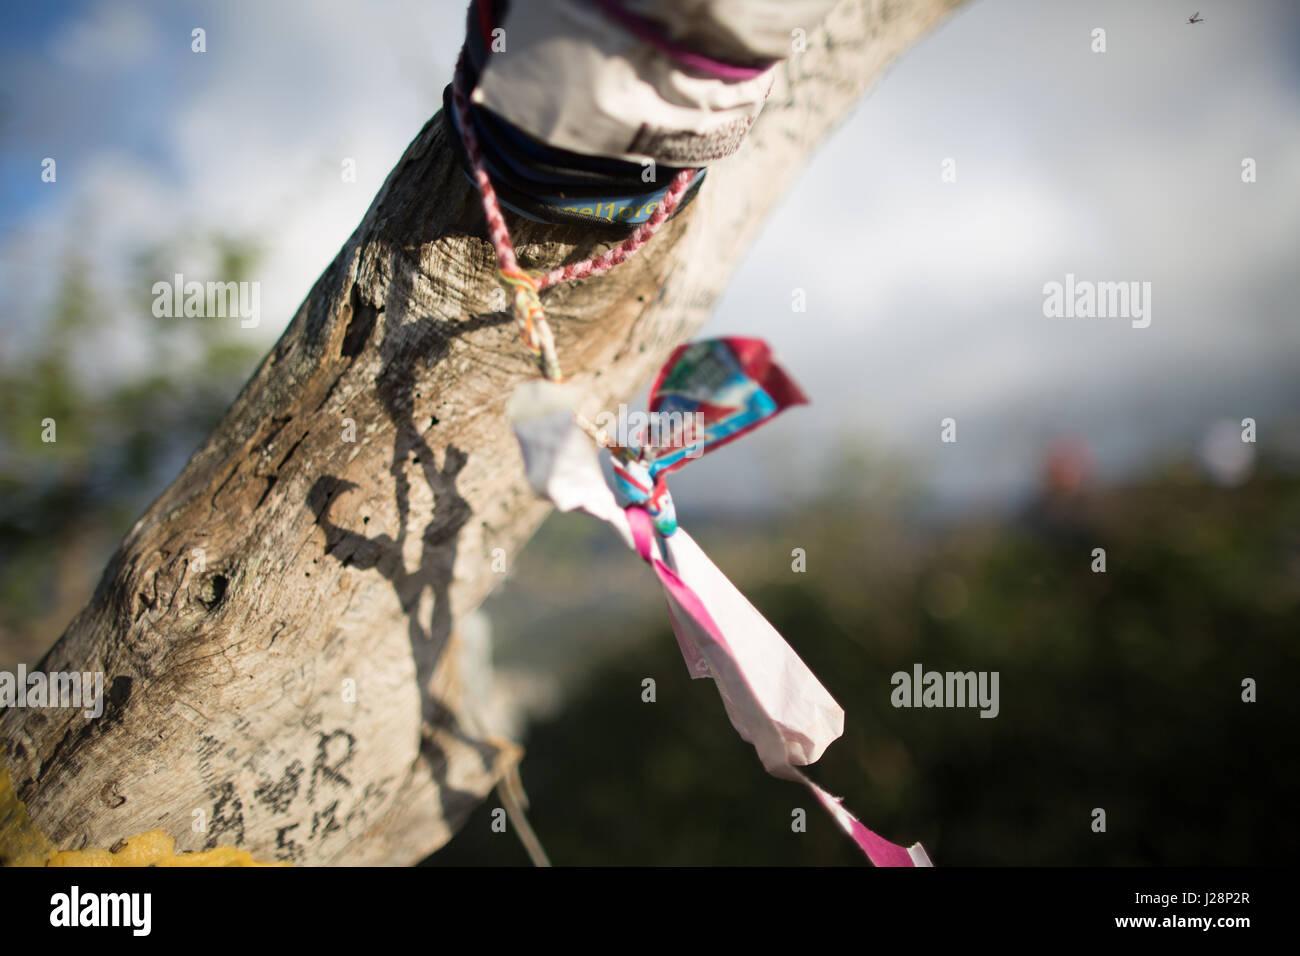 Ribbon on Tree - Stock Image